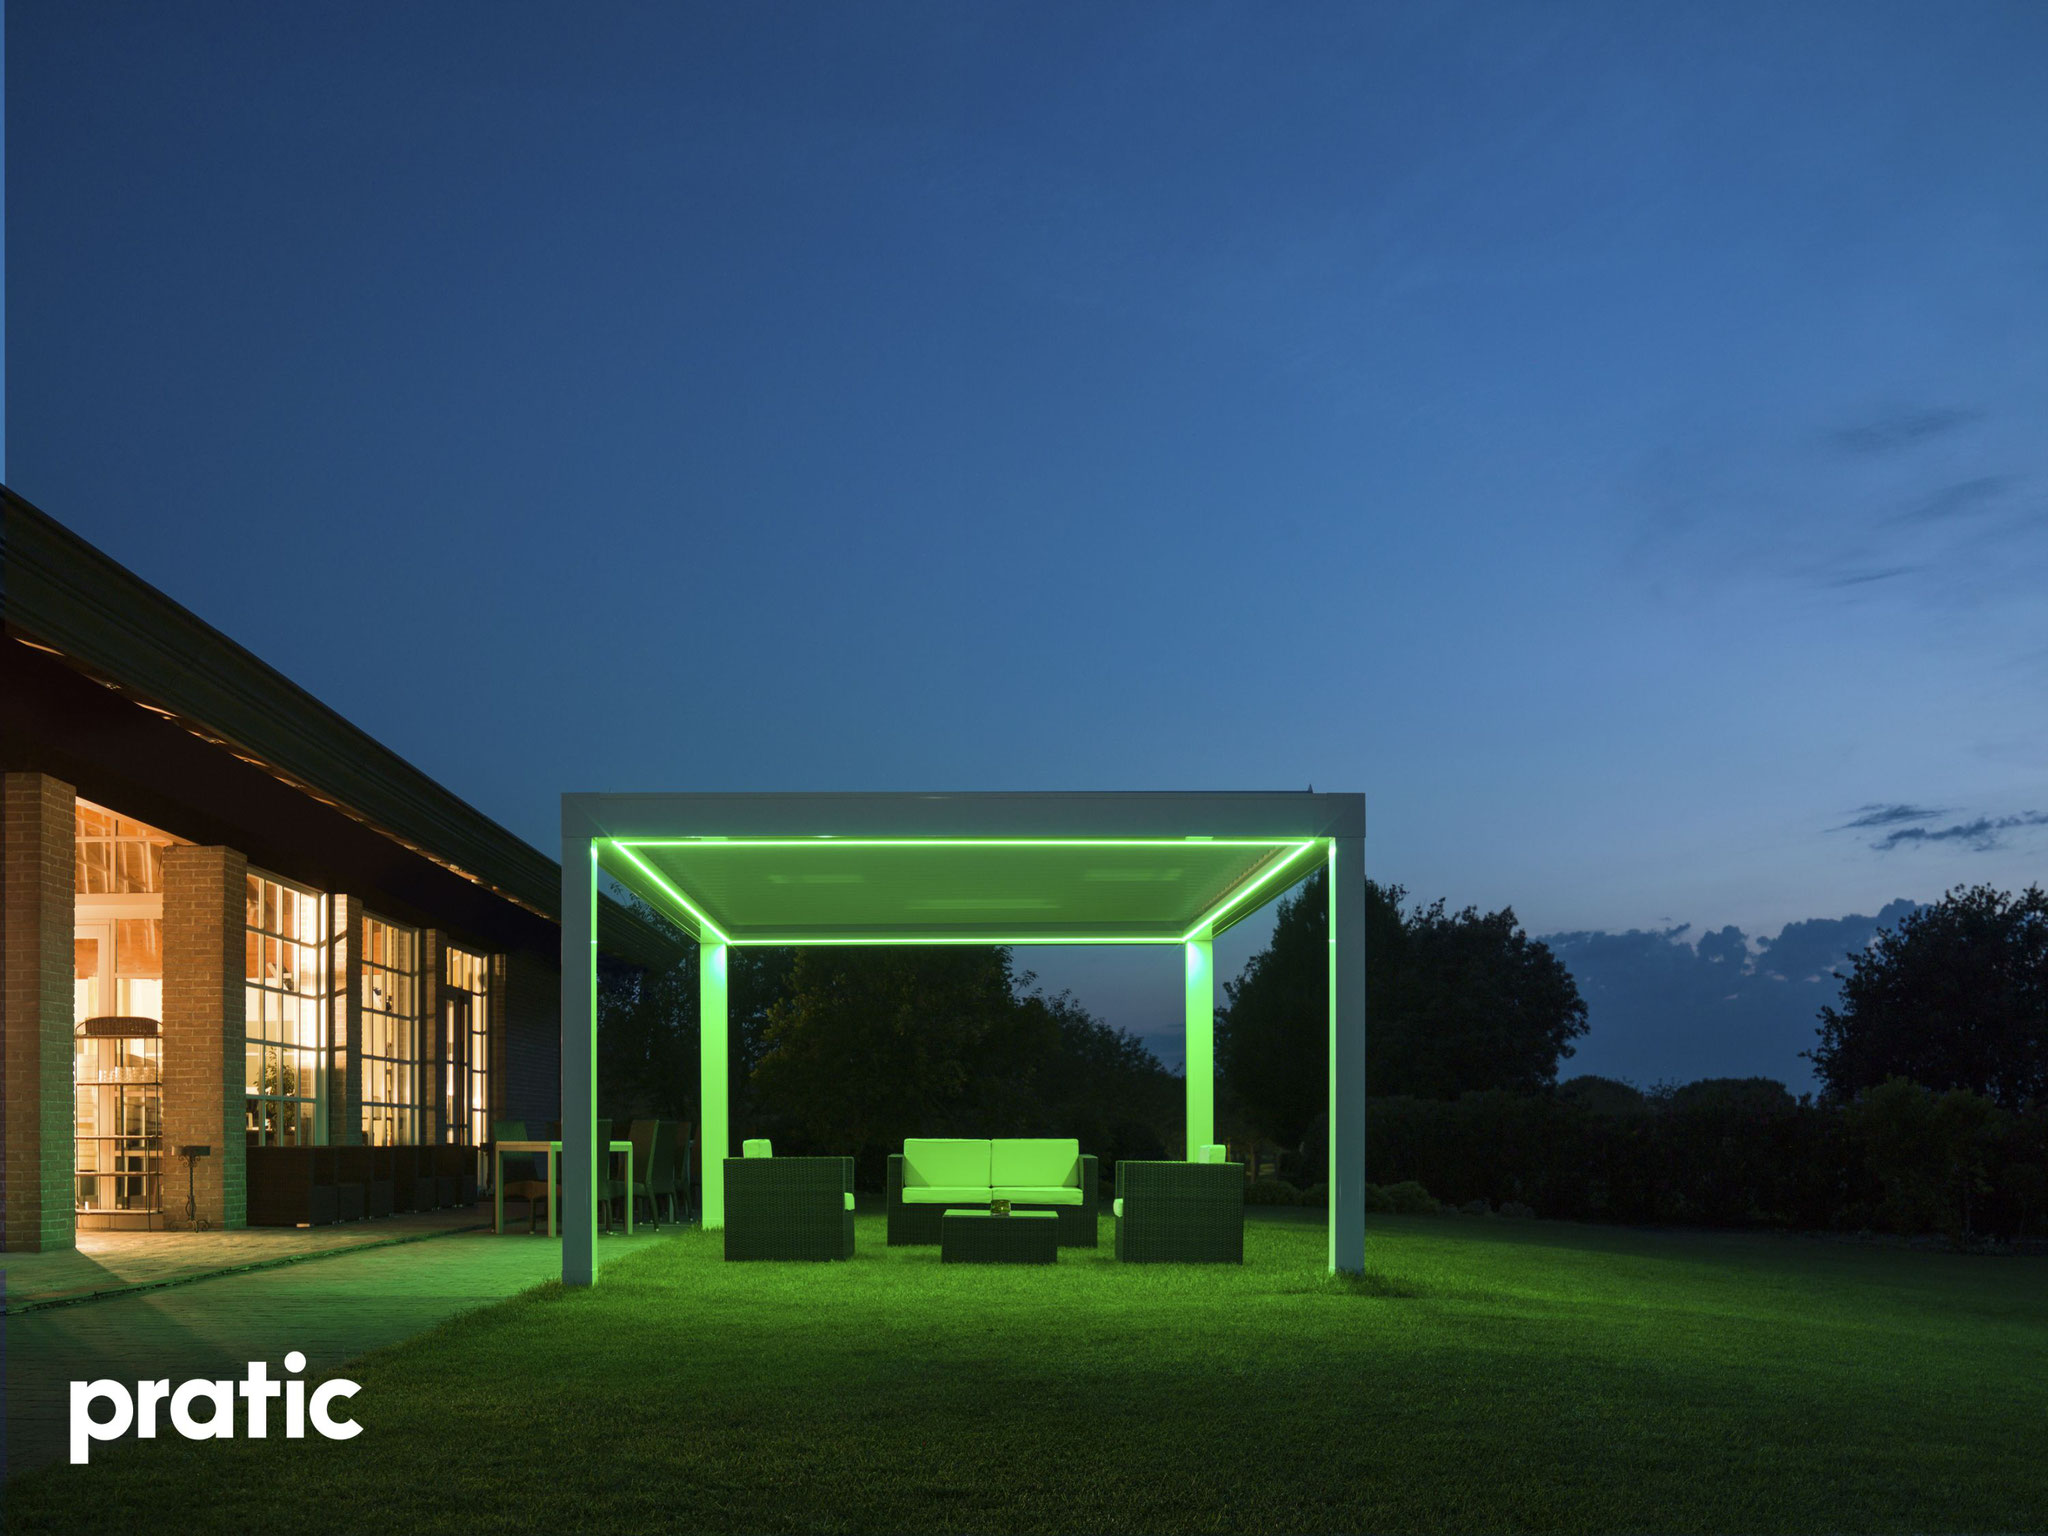 Pratic Lamellendach mit stimmiger LED Beleuchtung